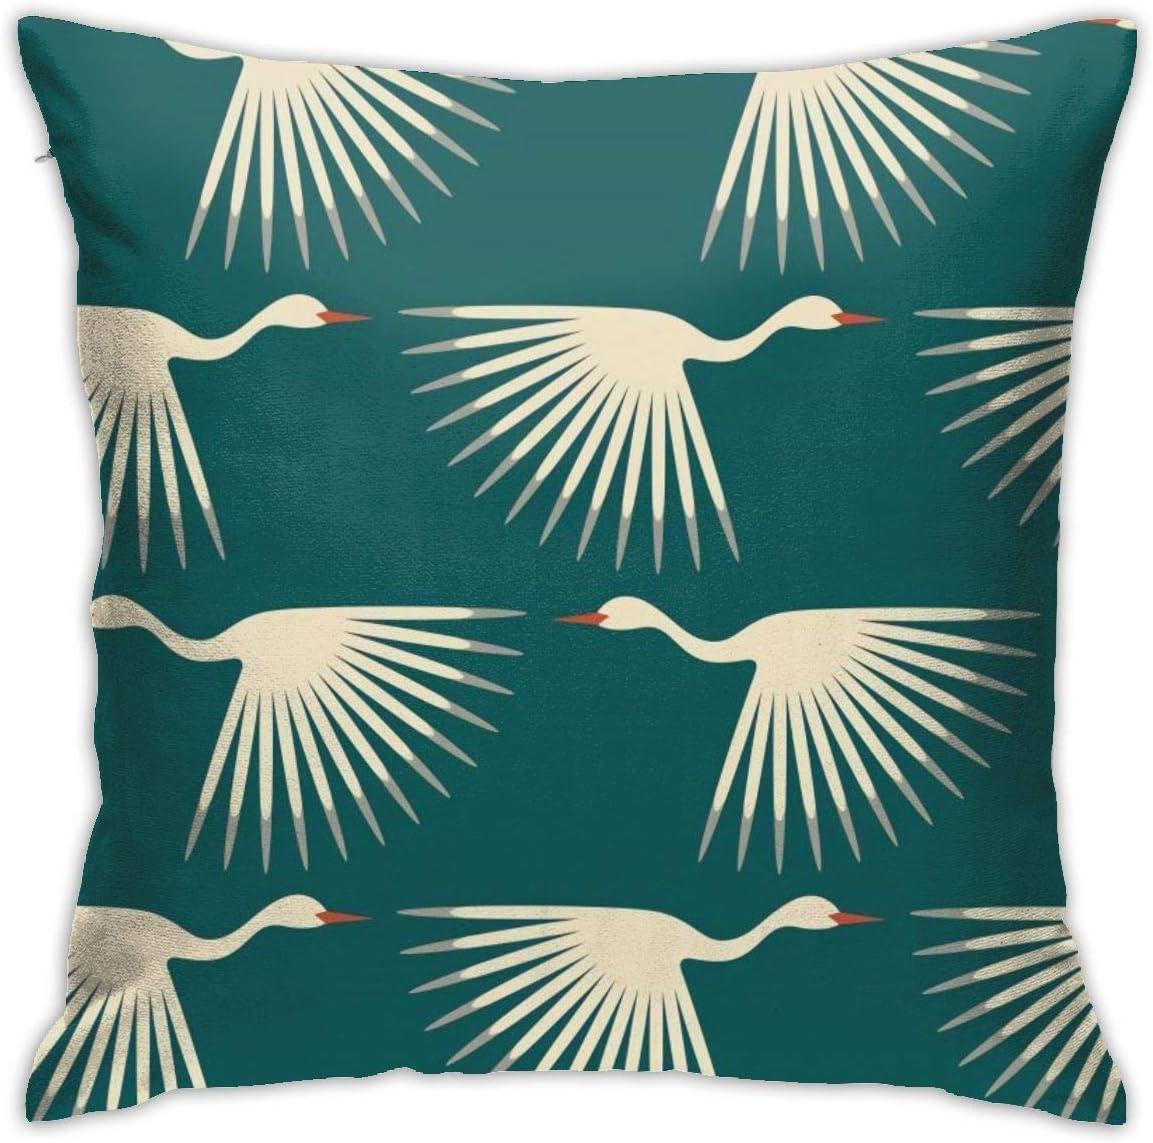 Antvinoler Art Deco Cranes Throw Pillow Case Soft Pillow Case For Decorative Bedroom Livingroom Sofa Farm House Cushion Covers Couch Pillow 18x18 Inch 45x45 Cm Home Kitchen